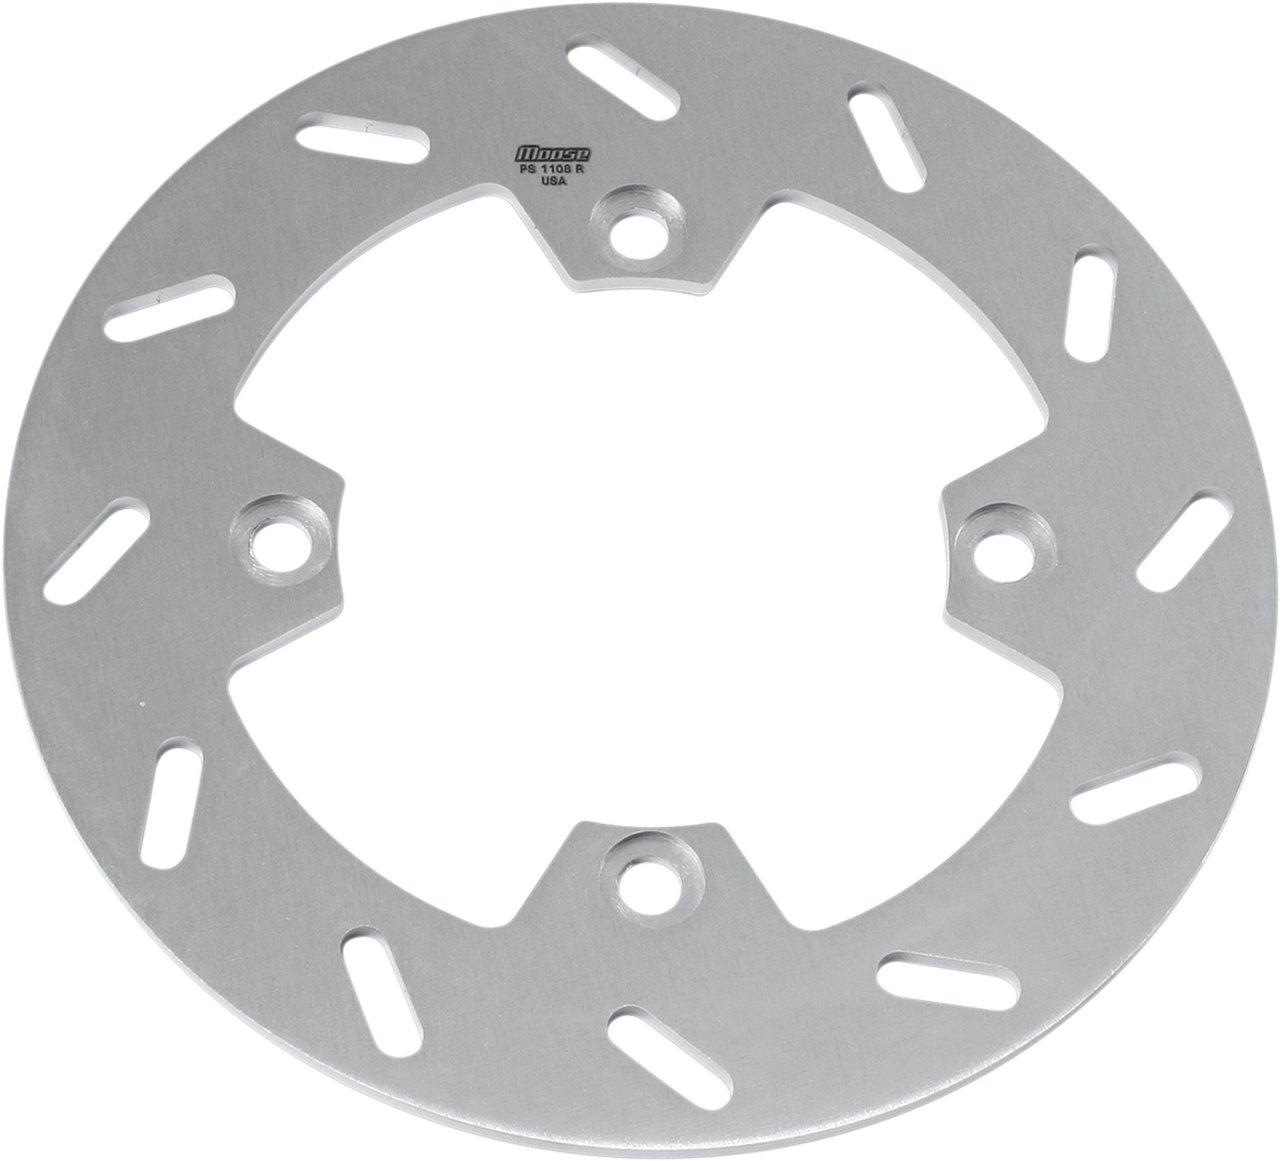 【MOOSE RACING】維修用煞車碟盤 [M061-1108] - 「Webike-摩托百貨」